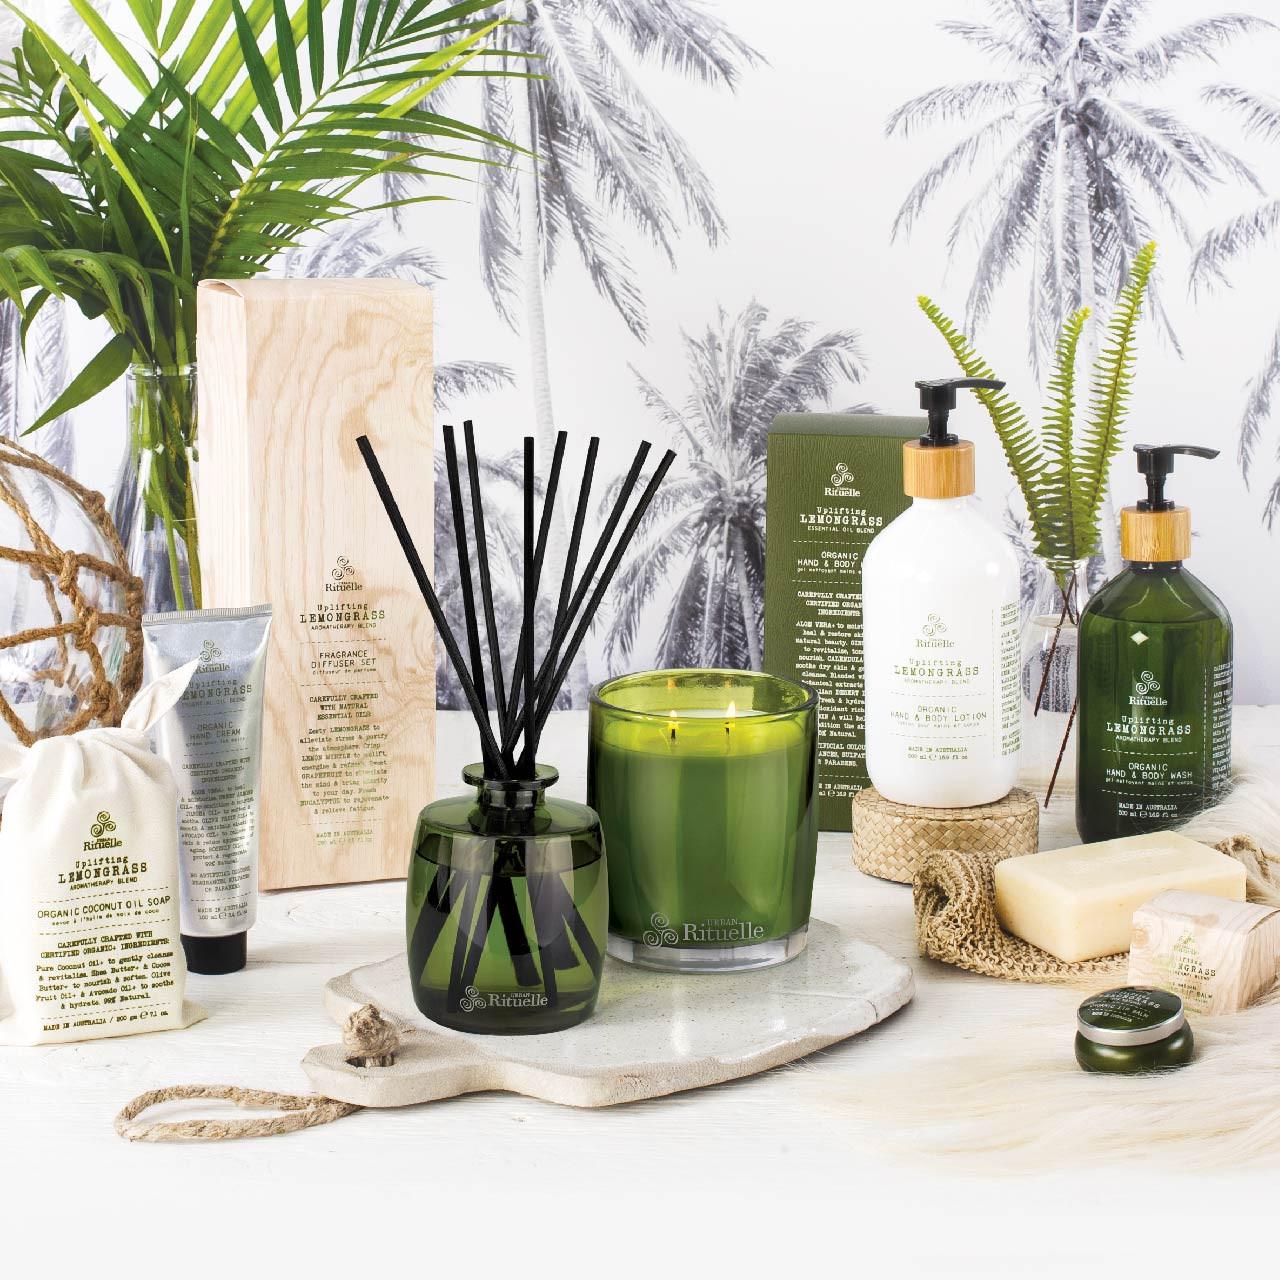 Flourish Organics - Hand & Body Wash - Lemongrass  - Urban Rituelle